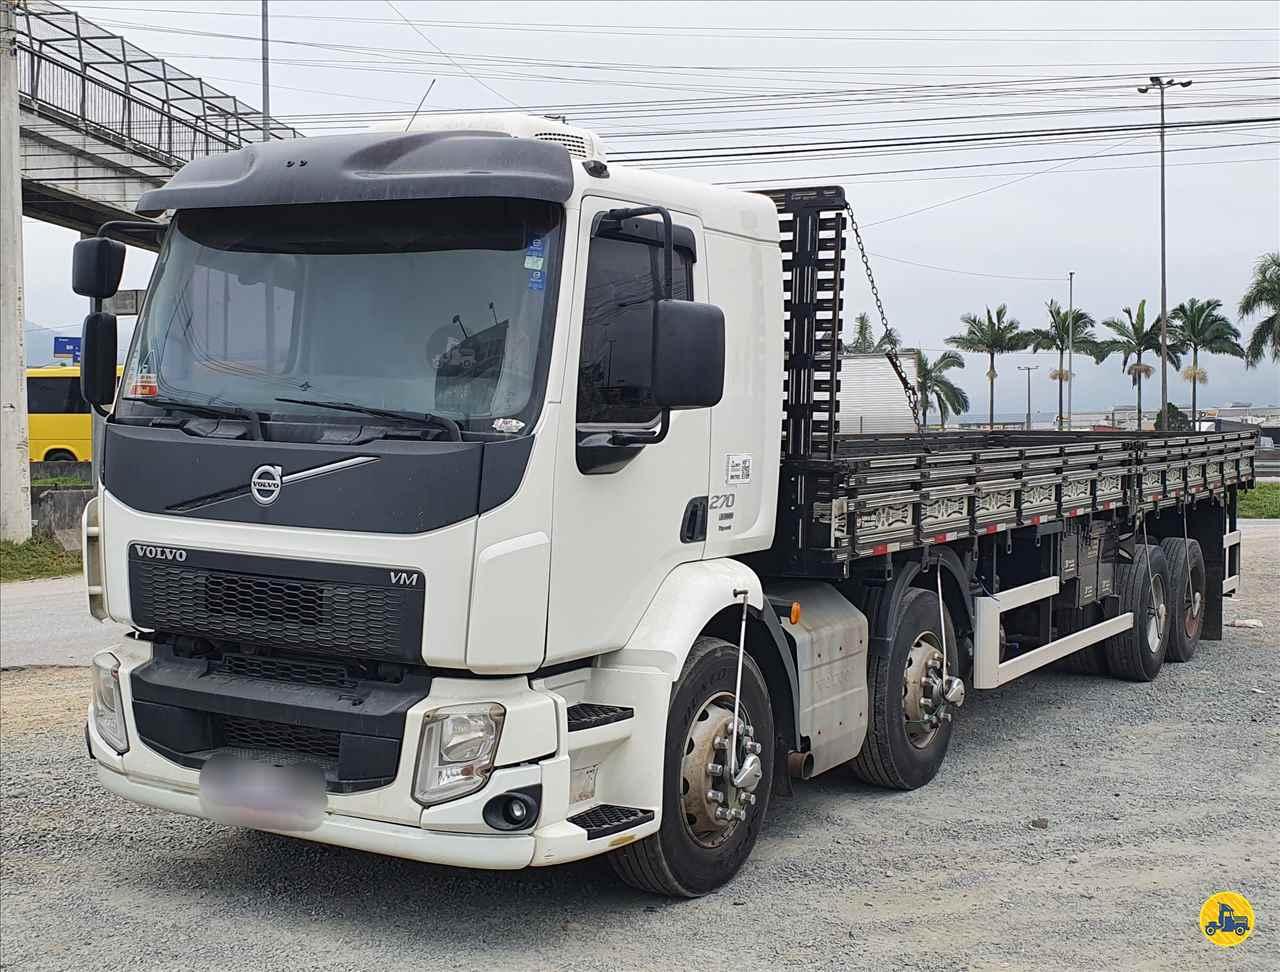 VOLVO VM 270 de Trevo Caminhões - AGB - ITAJAI/SC